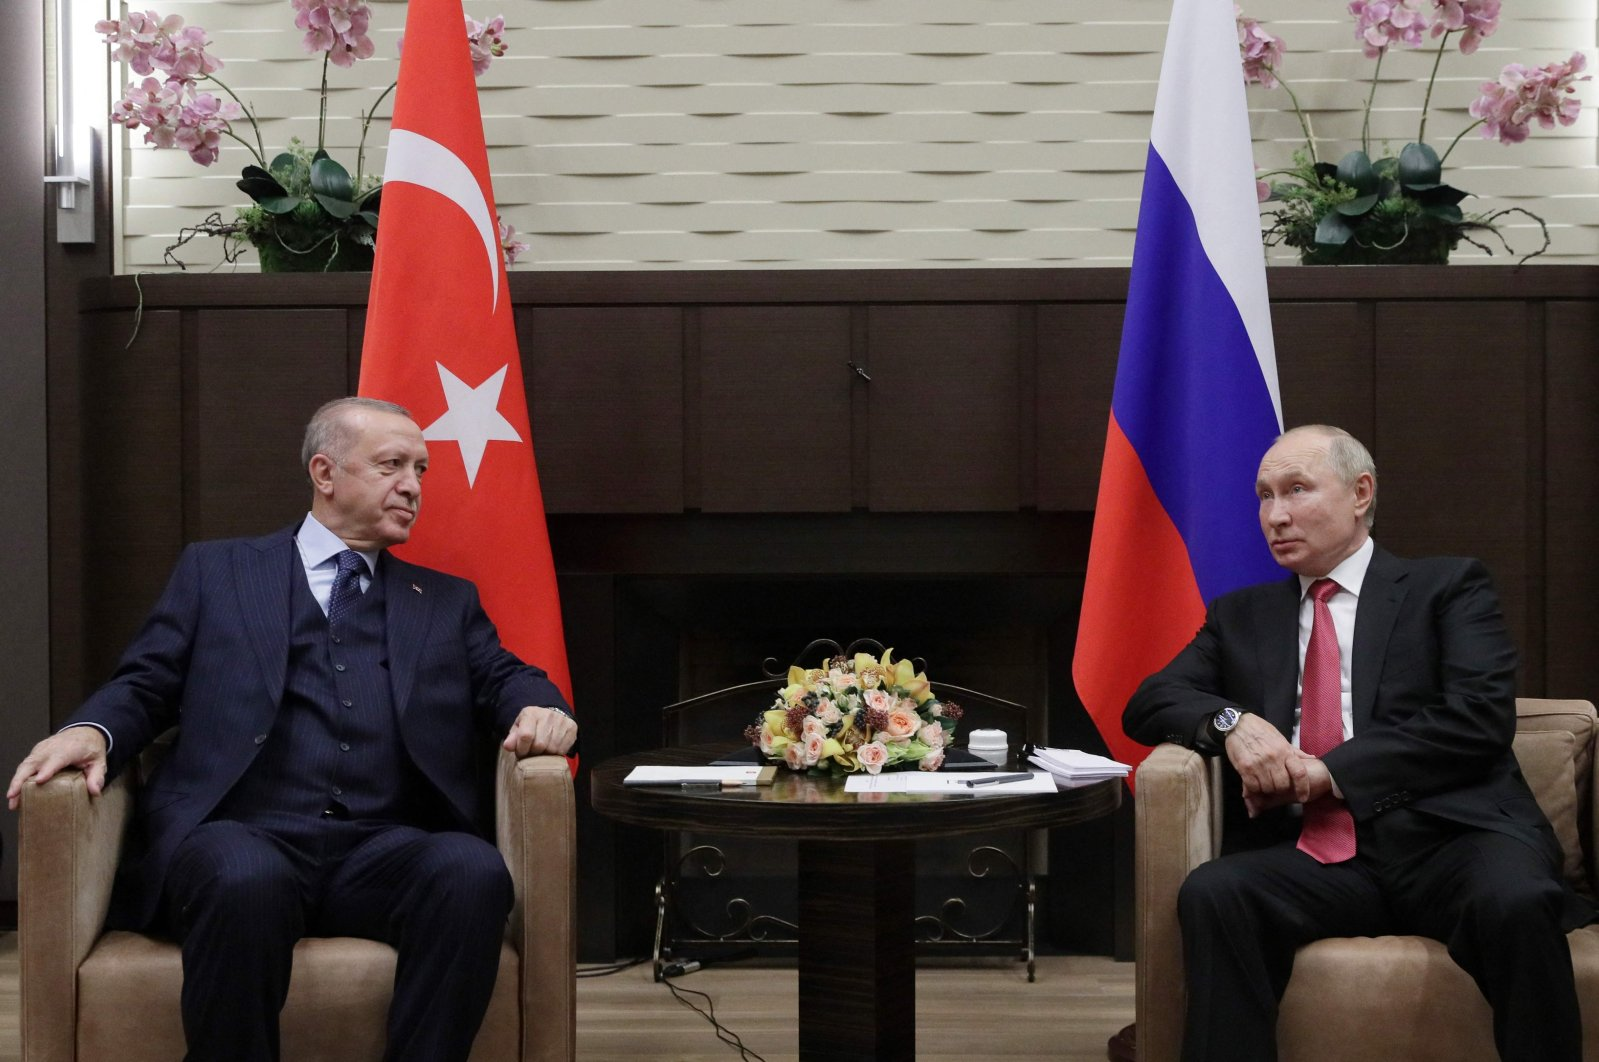 Russian President Vladimir Putin meets with his Turkish counterpart Recep Tayyip Erdoğan in Sochi, Russia, Sept. 29, 2021. (AFP Photo)